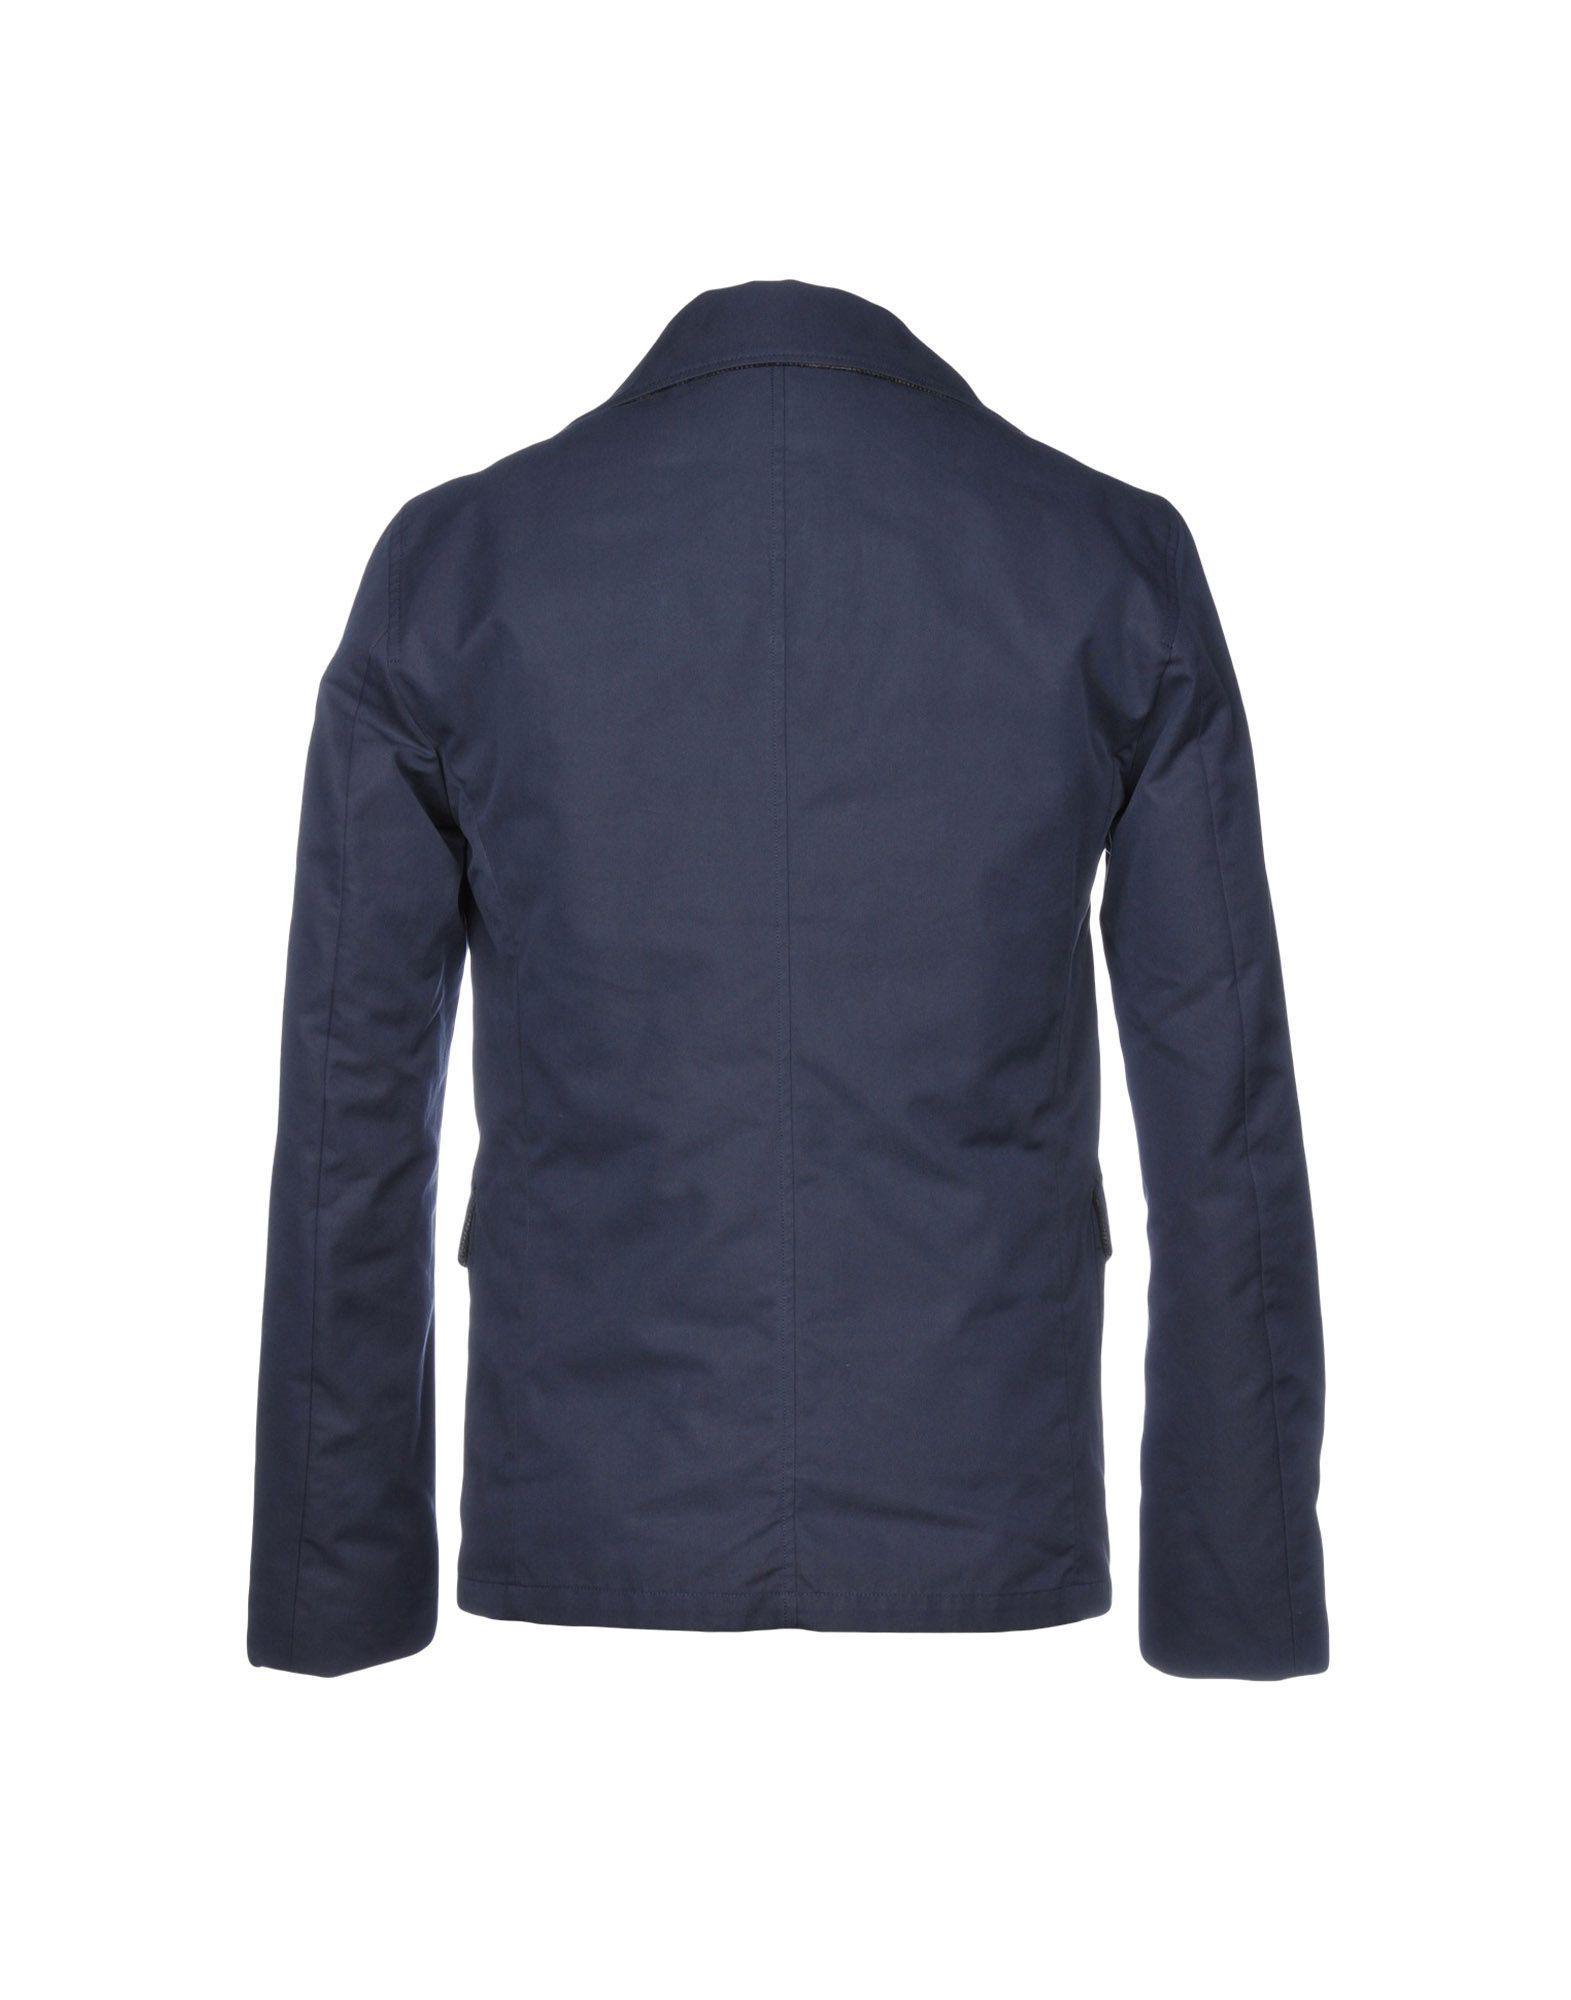 Geospirit Goose Down Jacket in Slate Blue (Blue) for Men